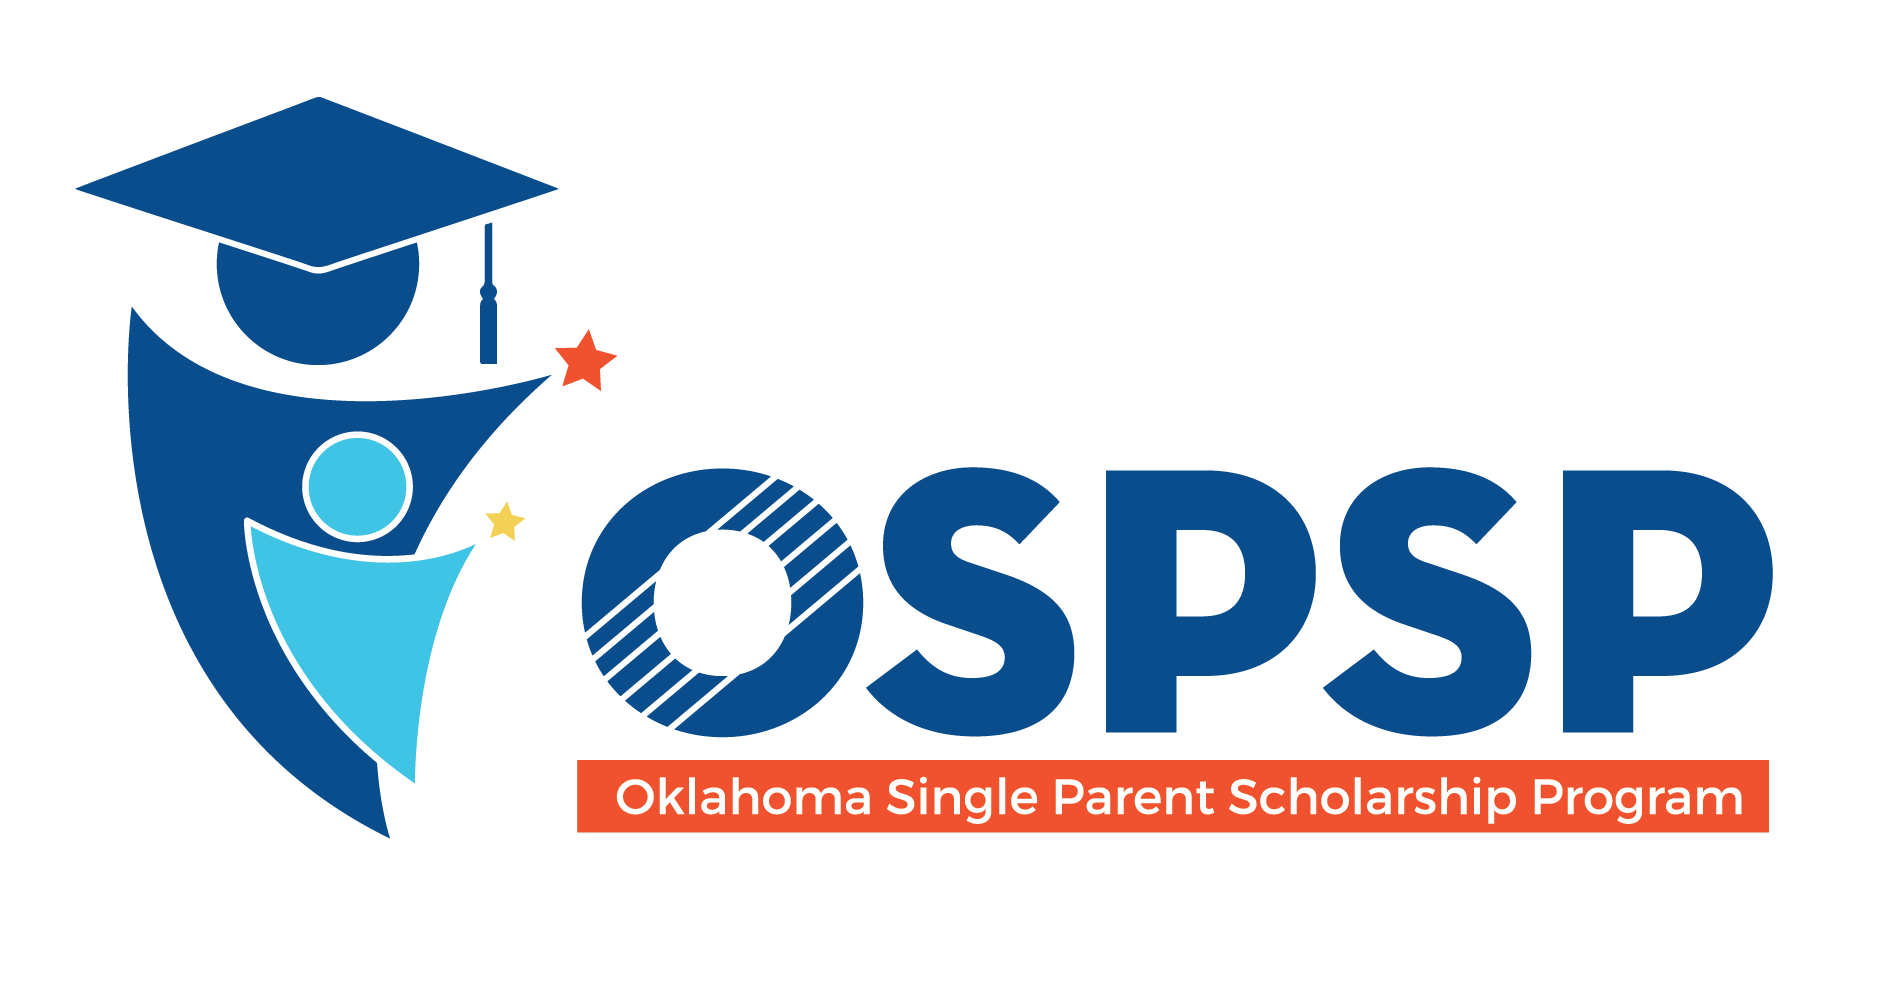 Oklahoma Single Parent Scholarship Program